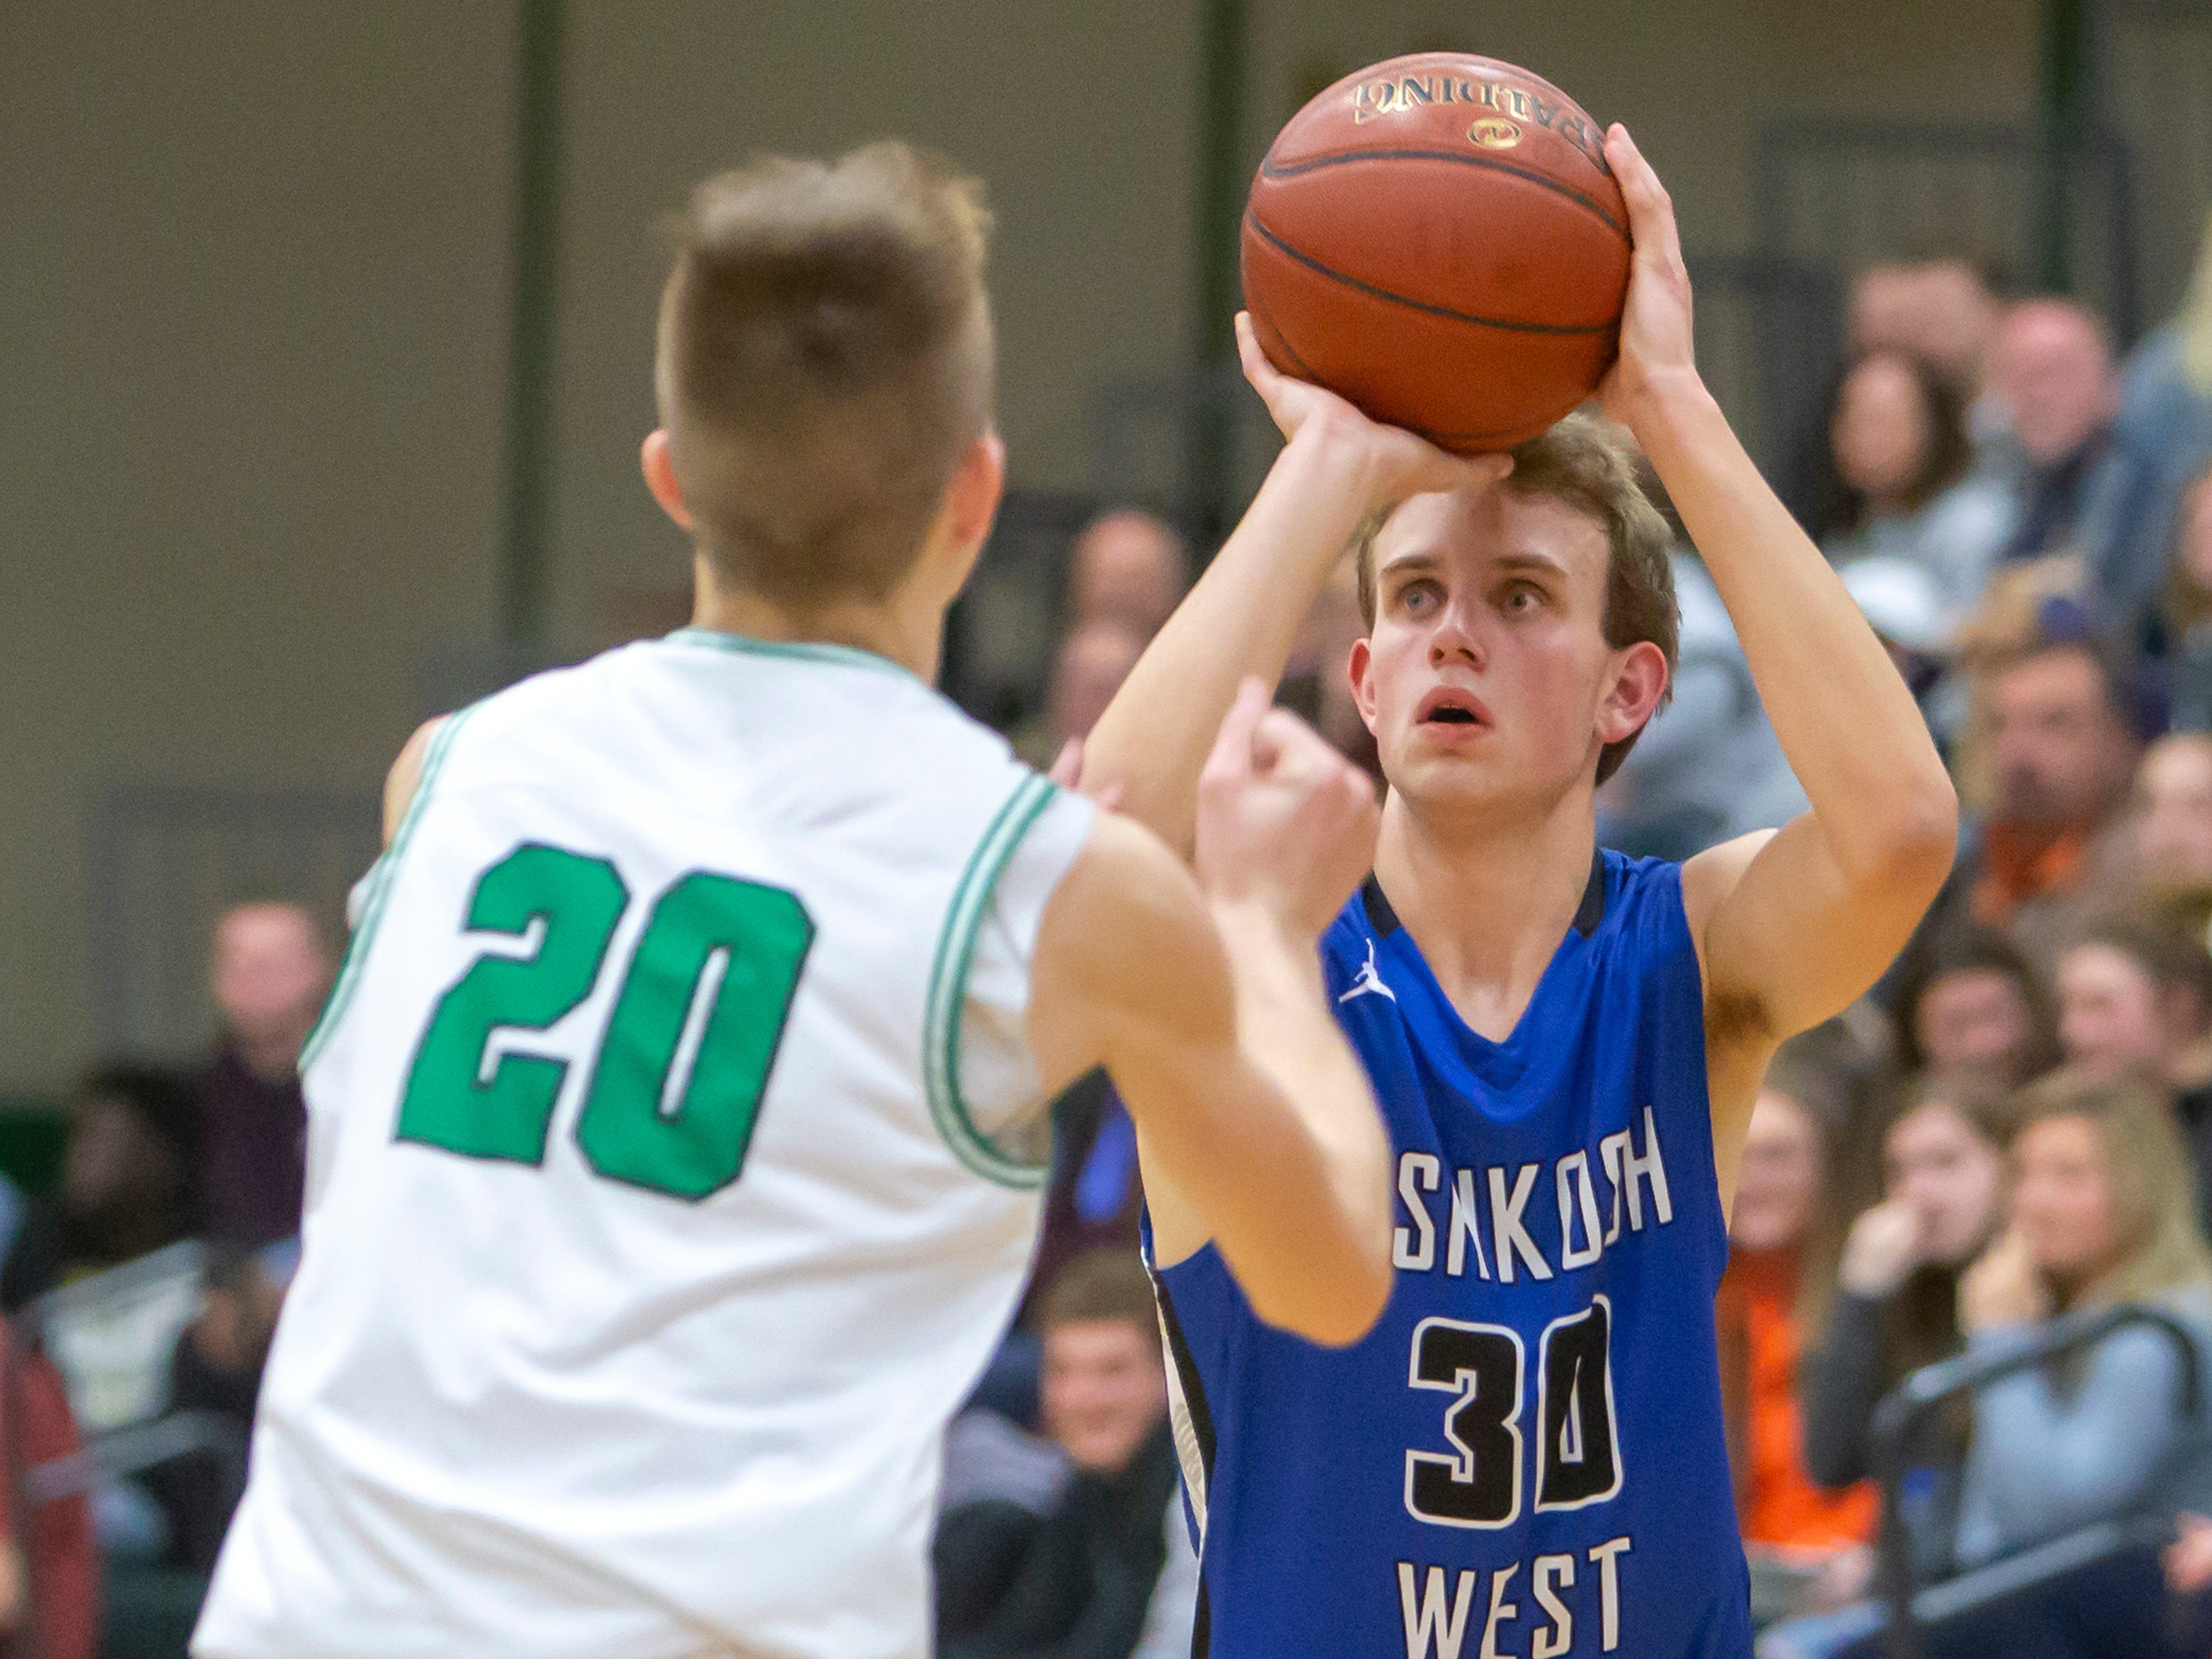 Oshkosh West's Caleb Fuller attempts a 3-pointer over Oshkosh North's Brennon Colburn at the Oshkosh North High School on Tuesday, Jan. 8, 2019.